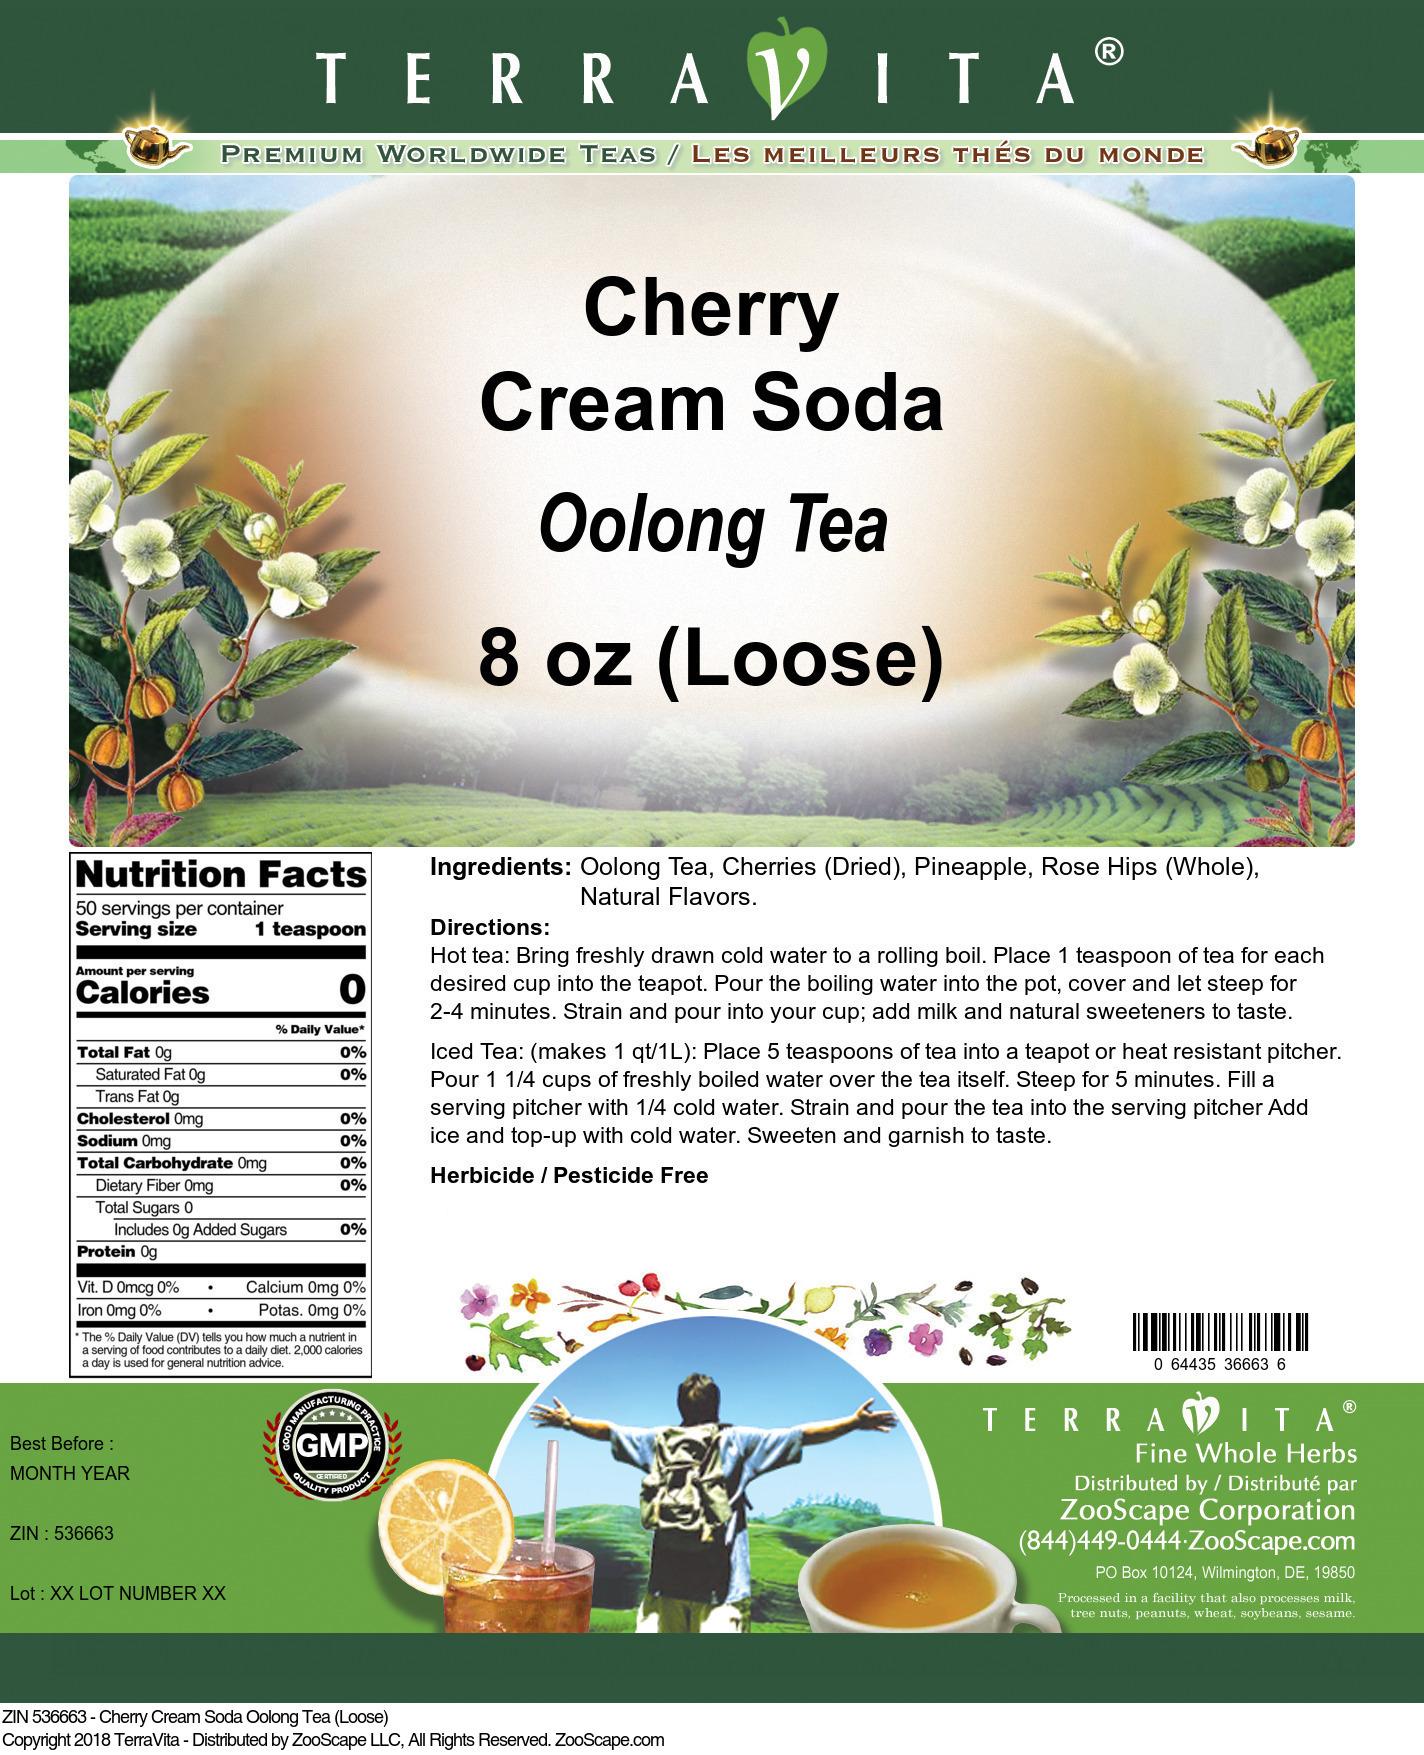 Cherry Cream Soda Oolong Tea